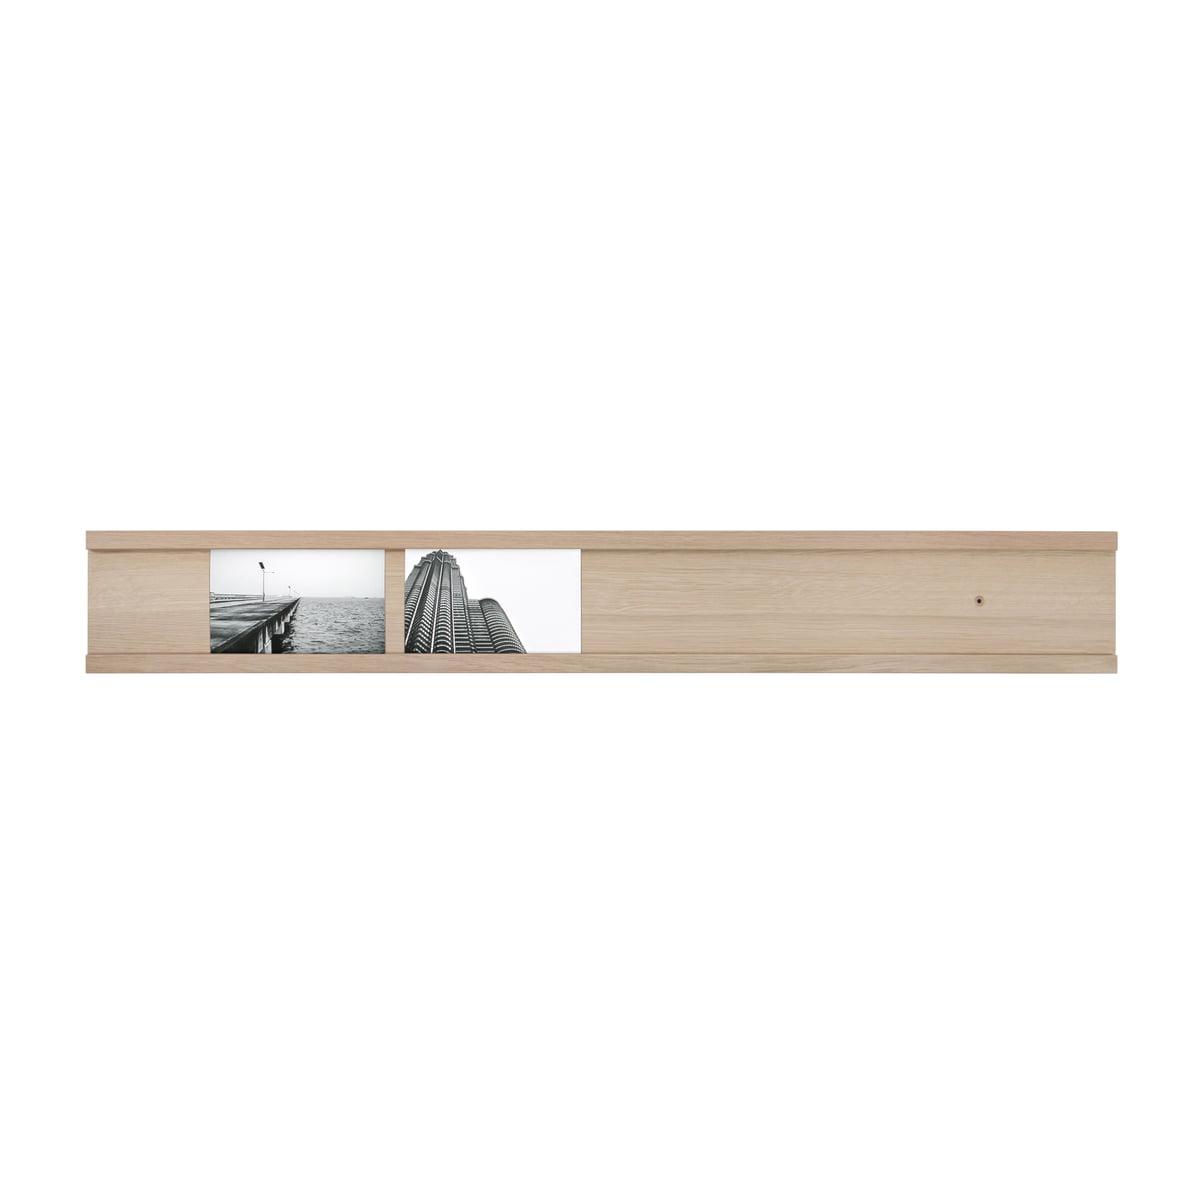 Connox collection - Galerie photo quotidienne bar photo 90 cm, chêne/transversal